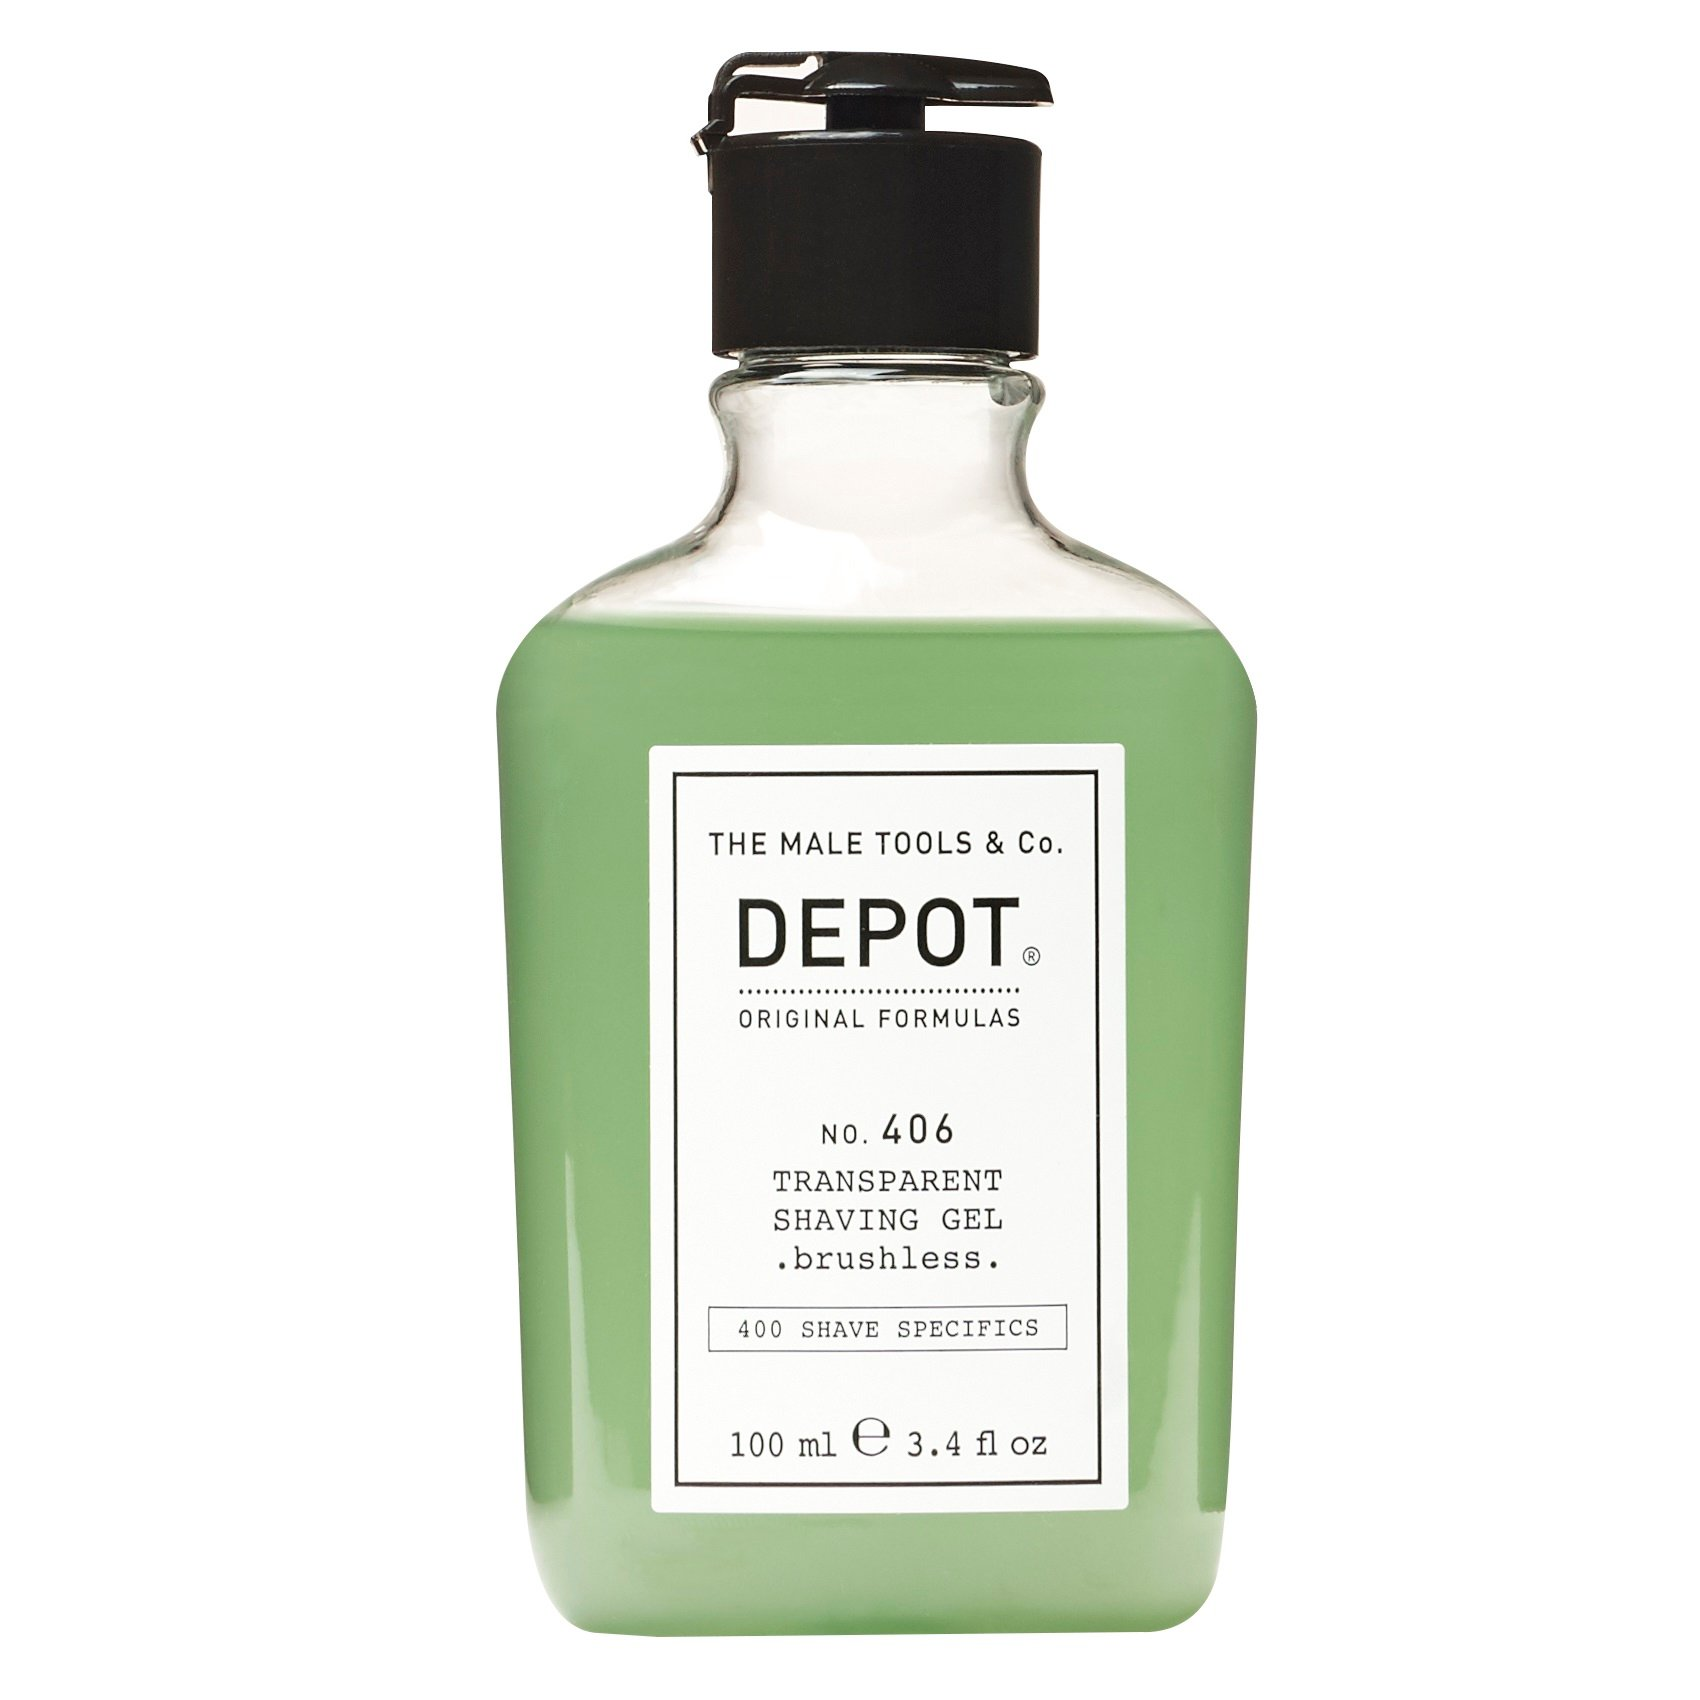 Depot - No. 406 Transparent Shaving Gel Brushless 100 ml